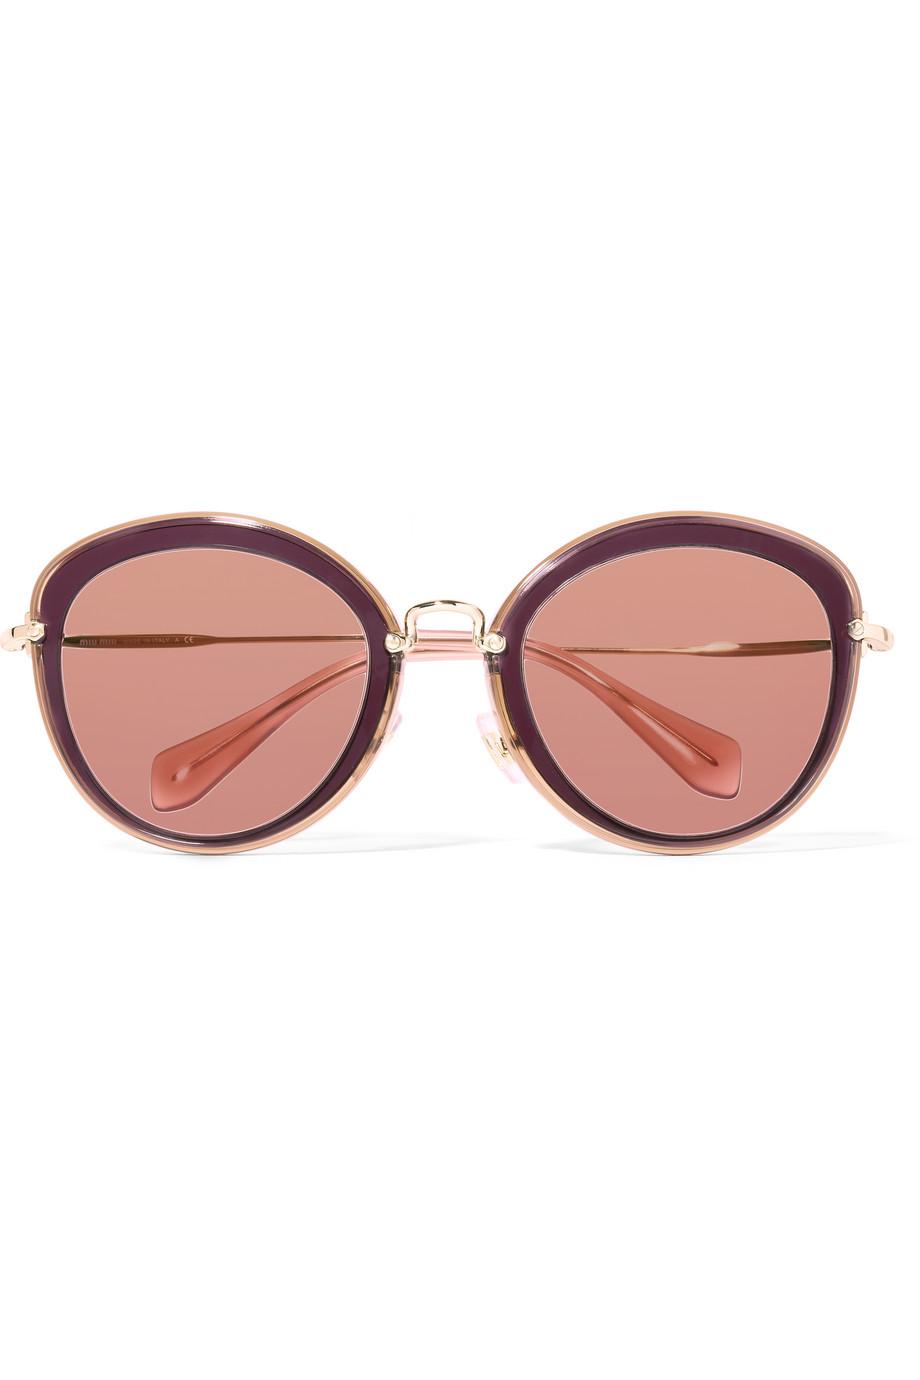 Miu Miu Noir Round-Frame Acetate and Gold-Tone Sunglasses